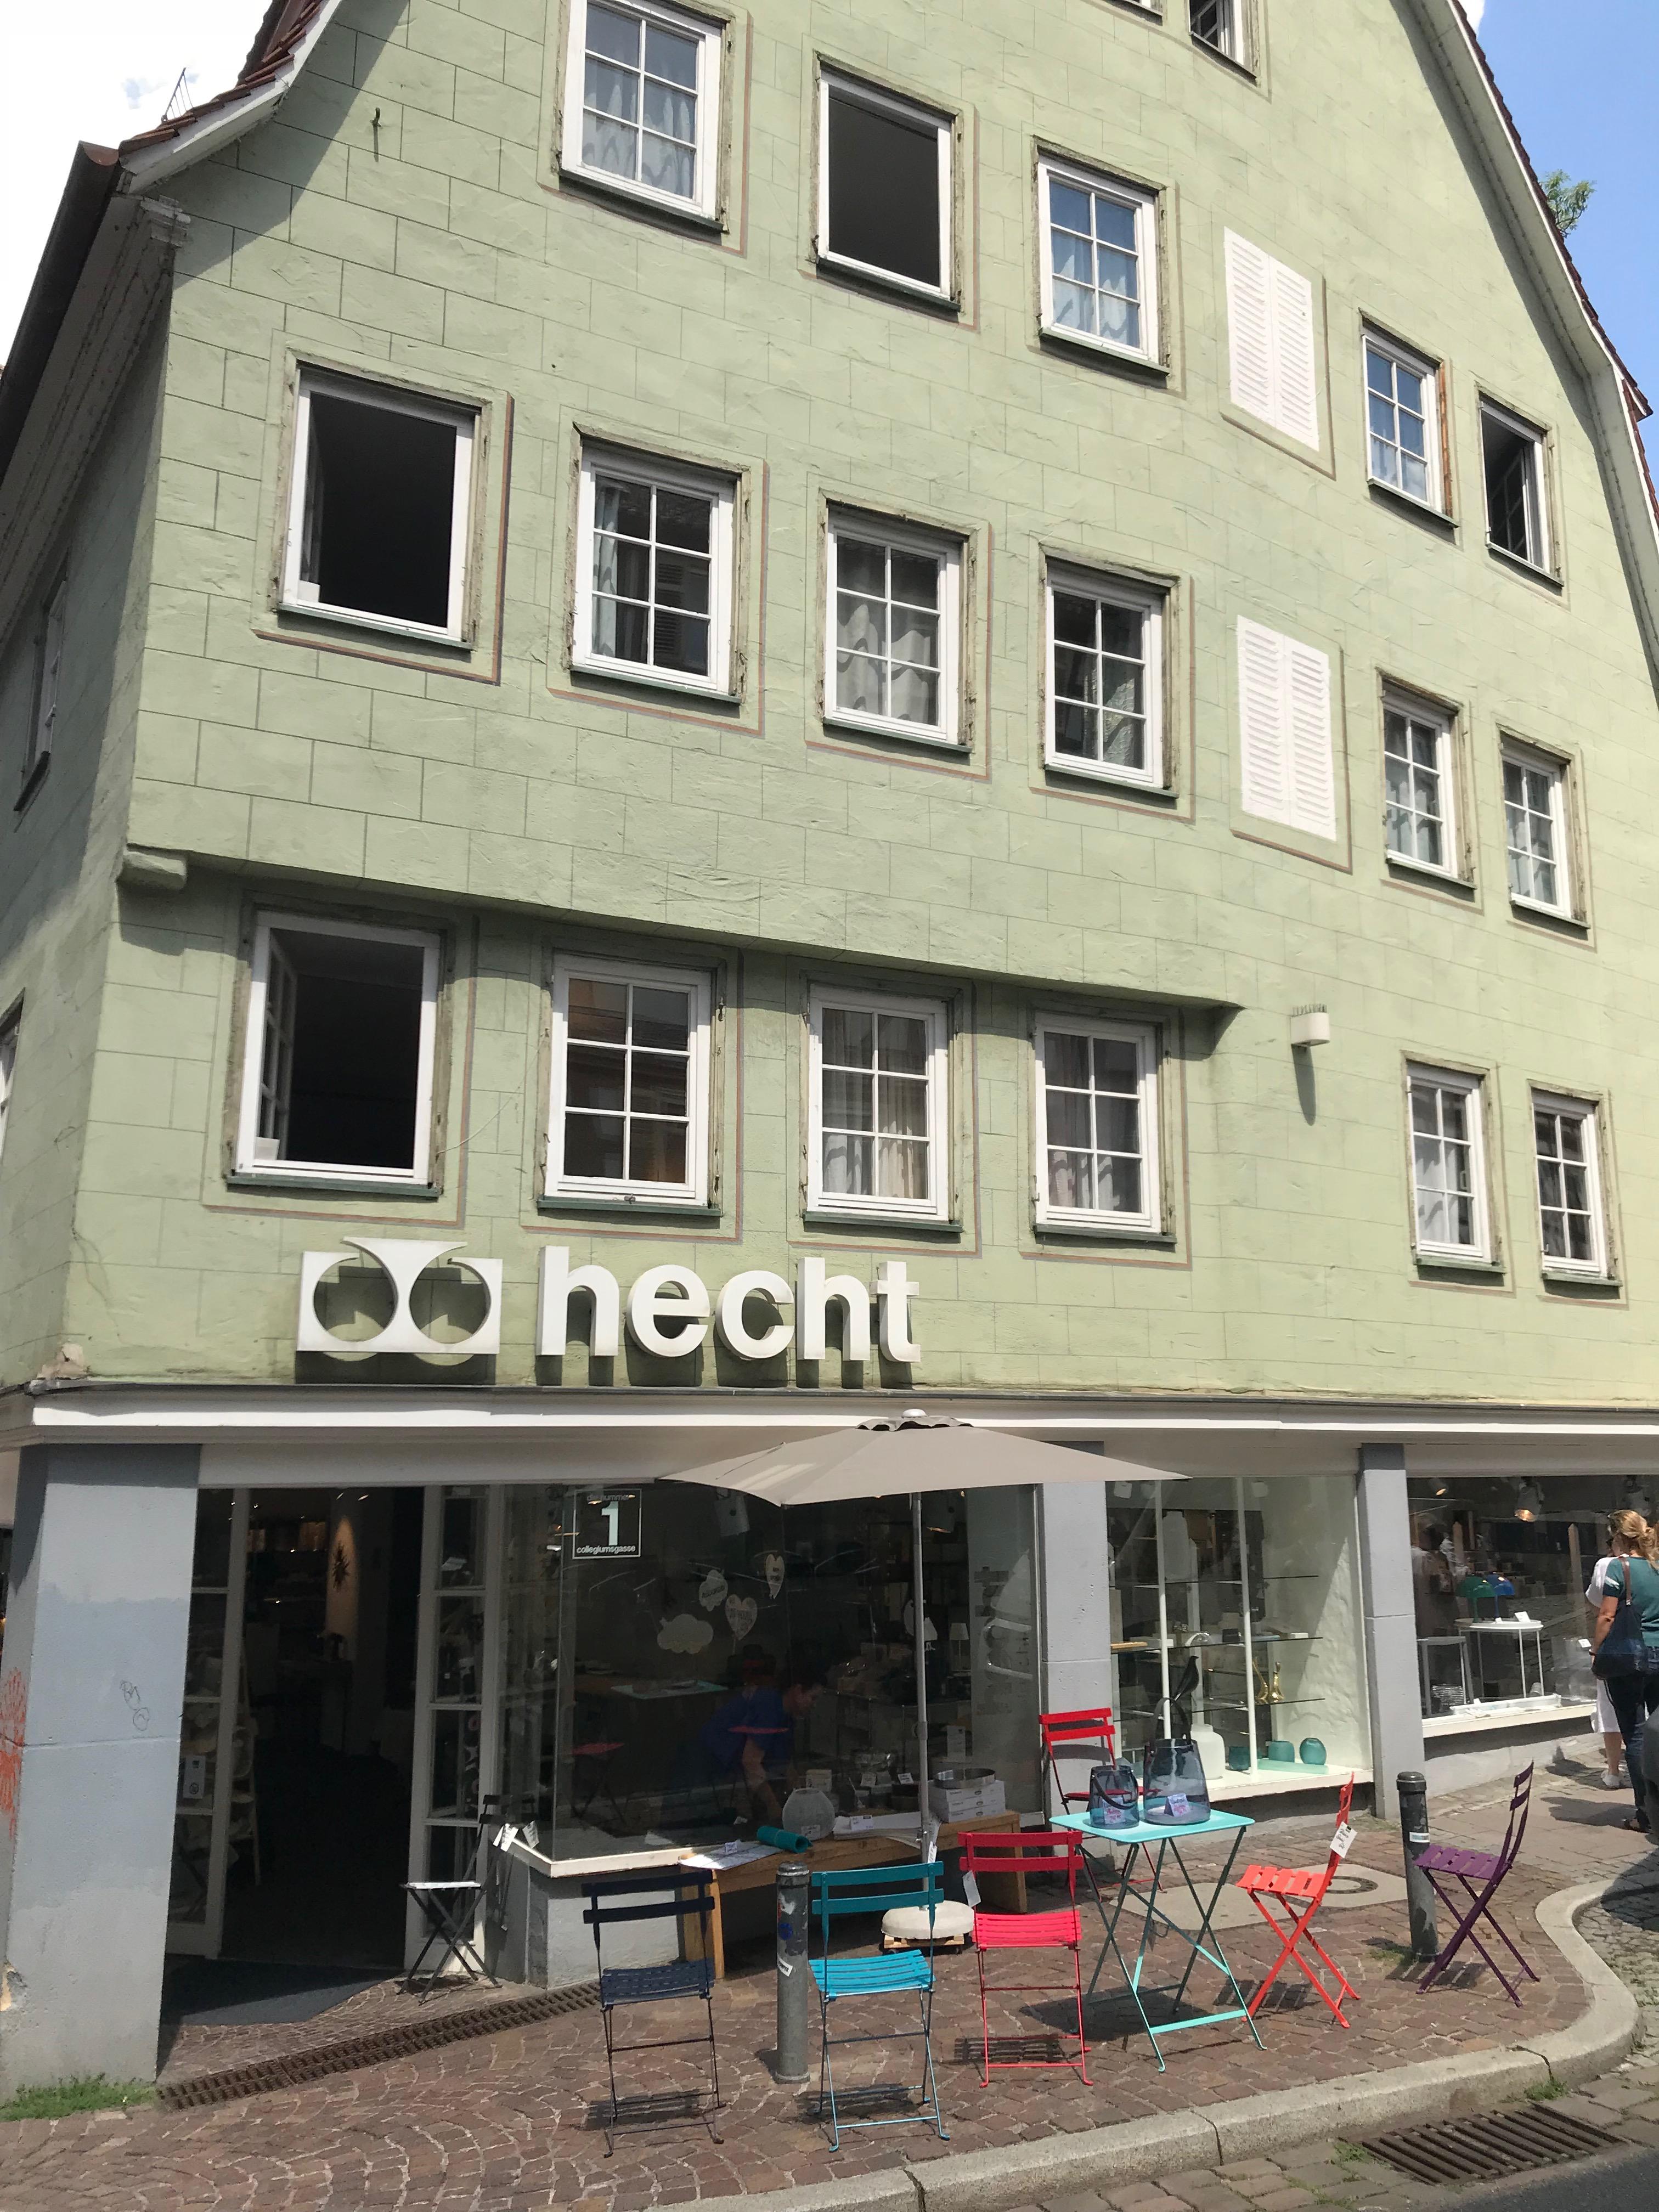 Verkaufsoffener Sonntag in Tübingen am 07.April 2019